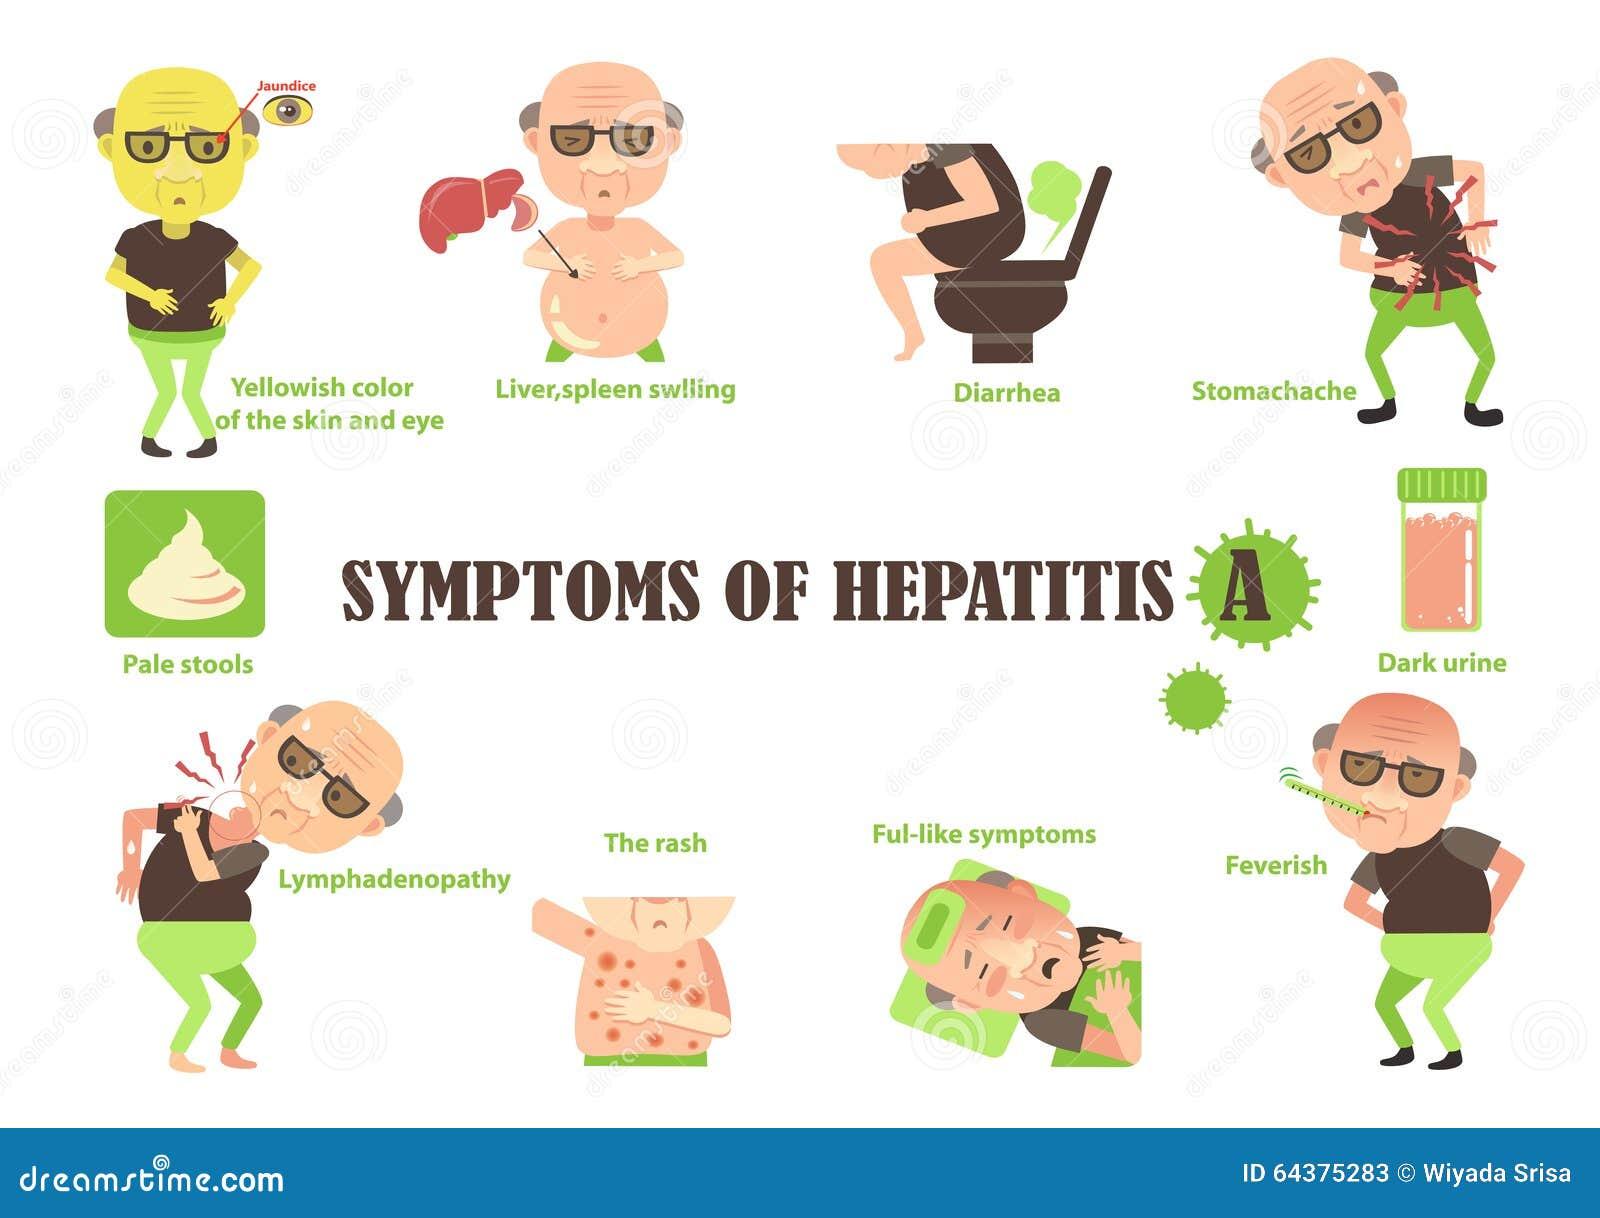 Symptoms of hepatitis a stock vector. Illustration of